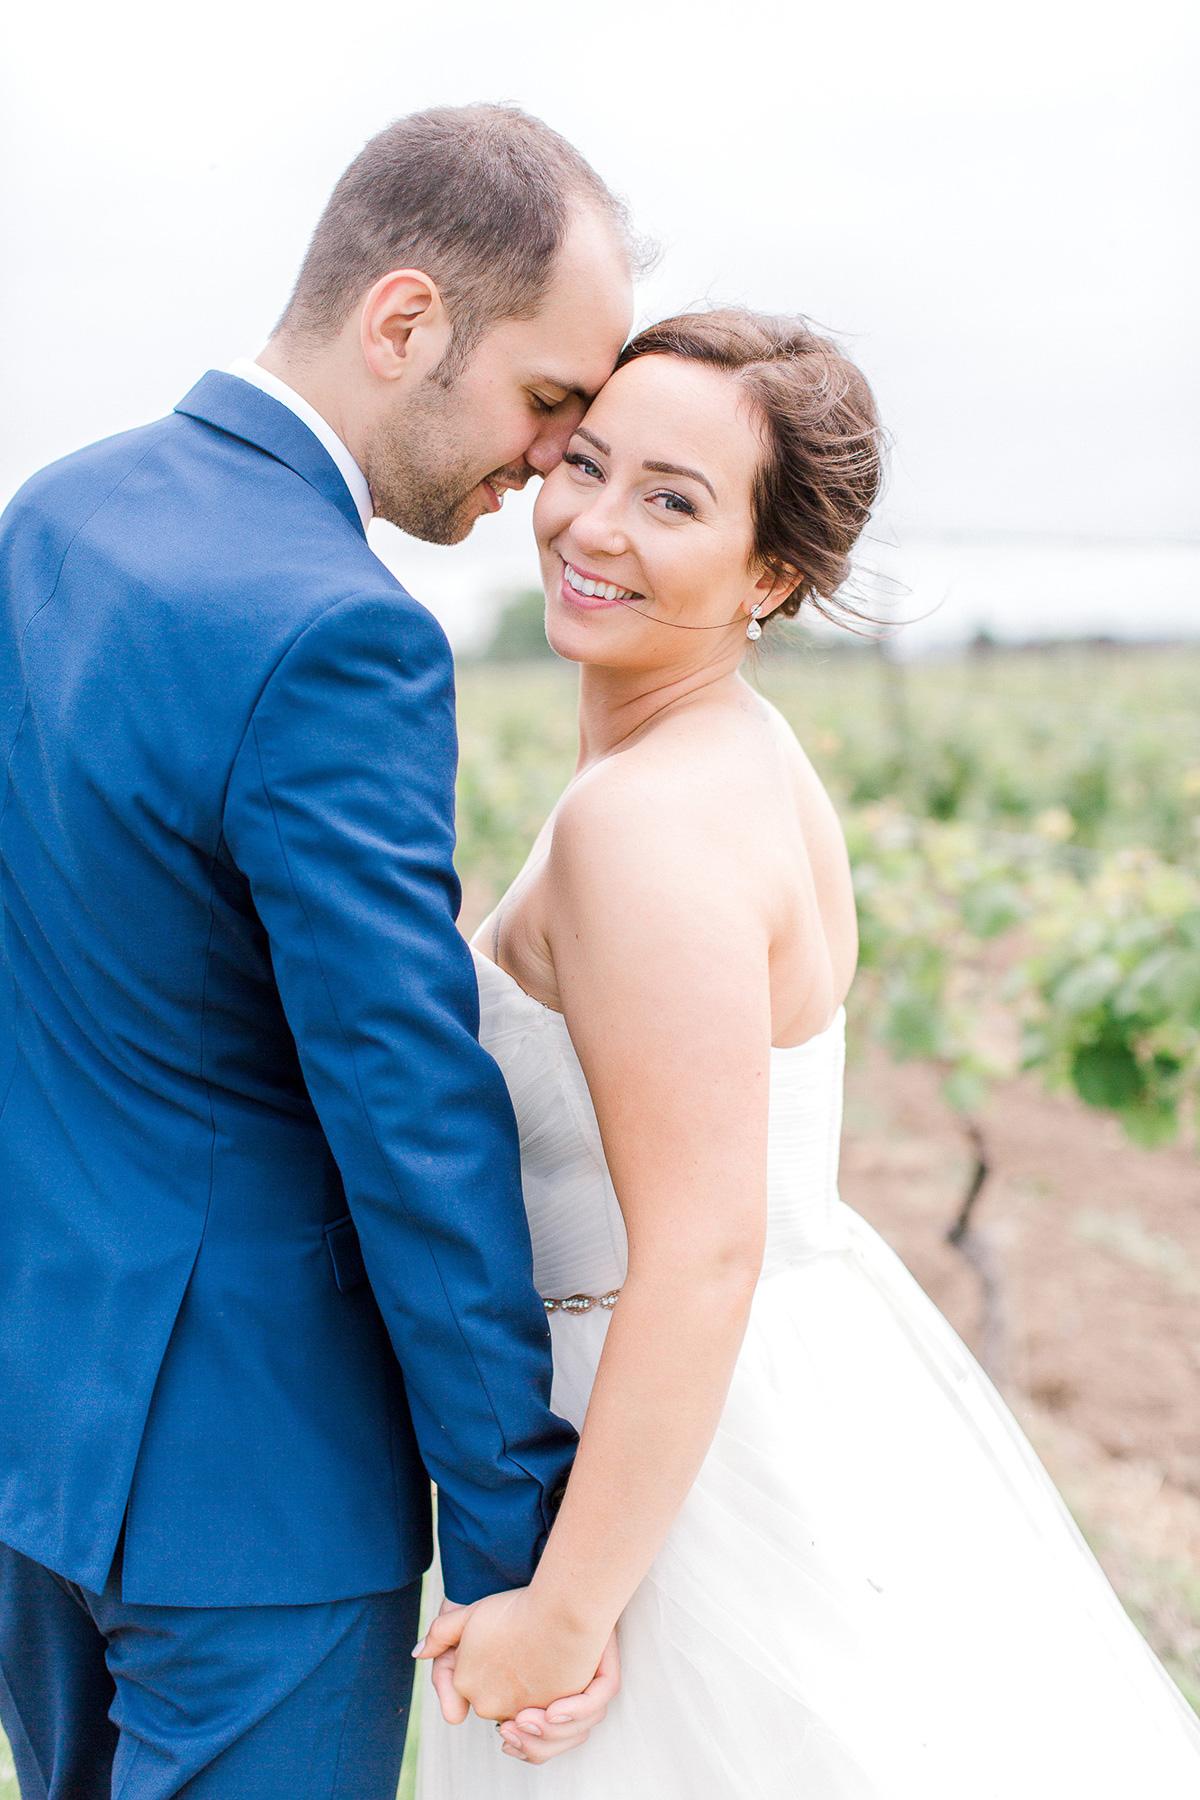 beatrice-elford-photography-vineyard-bride-swish-list-balls-falls-vineland-wedding-24.jpg